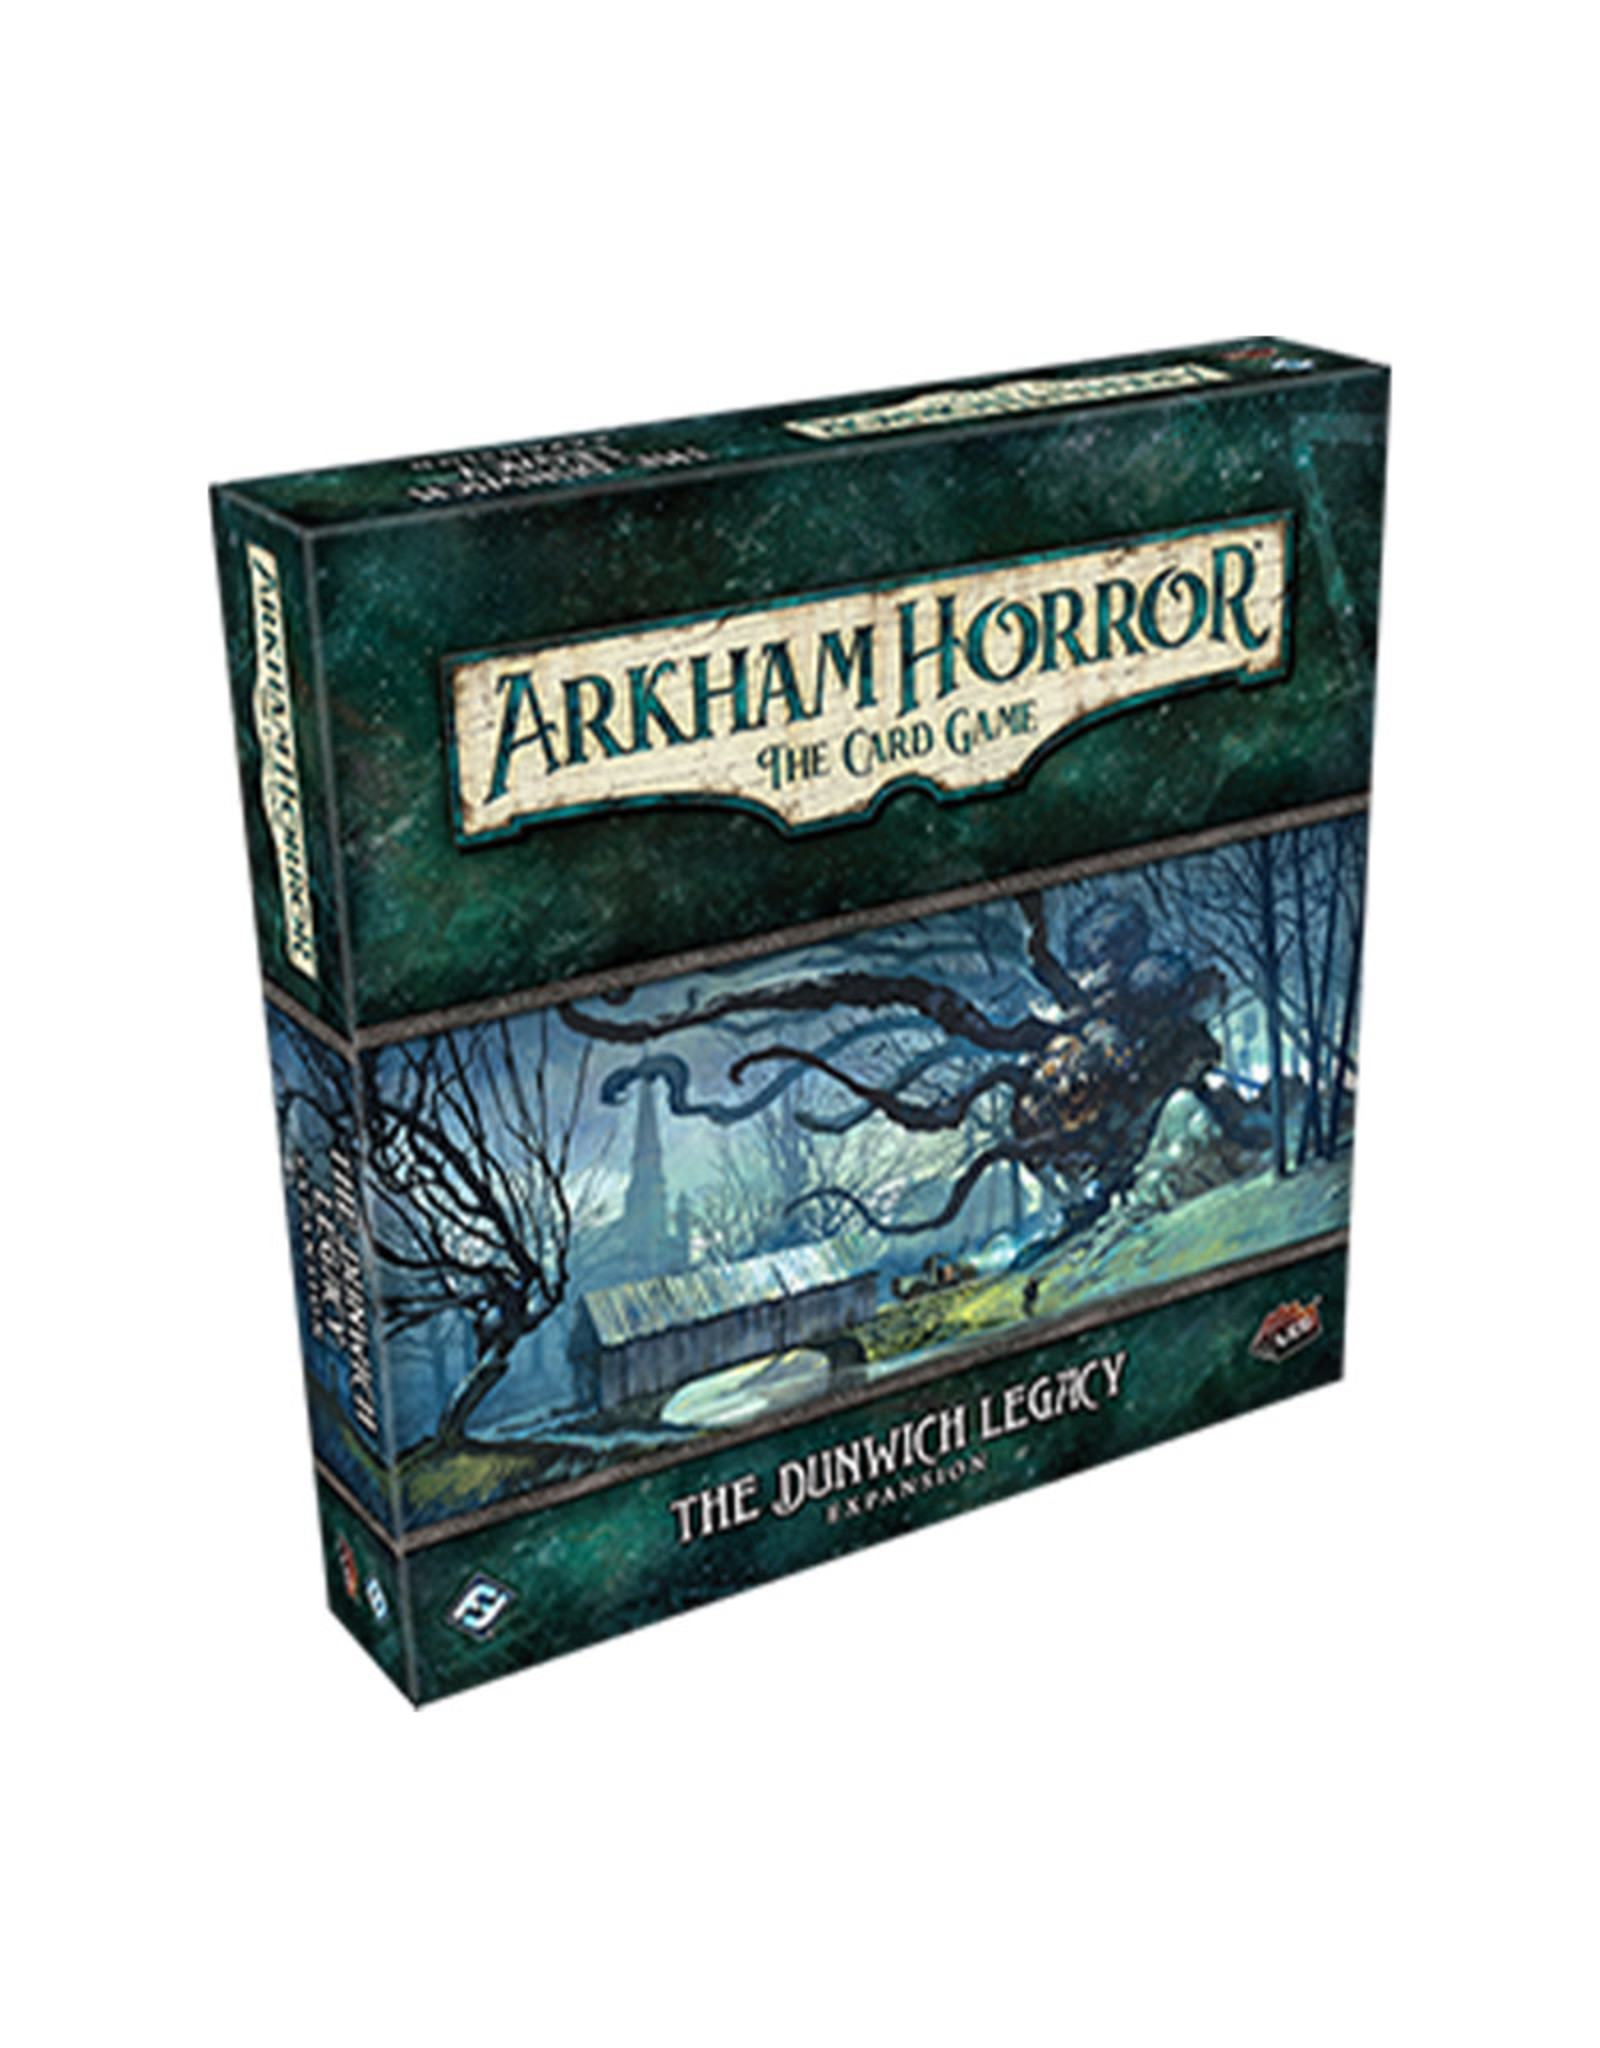 Fantasy Flight Games Arkham Horror LCG Expansion The Dunwich Legacy